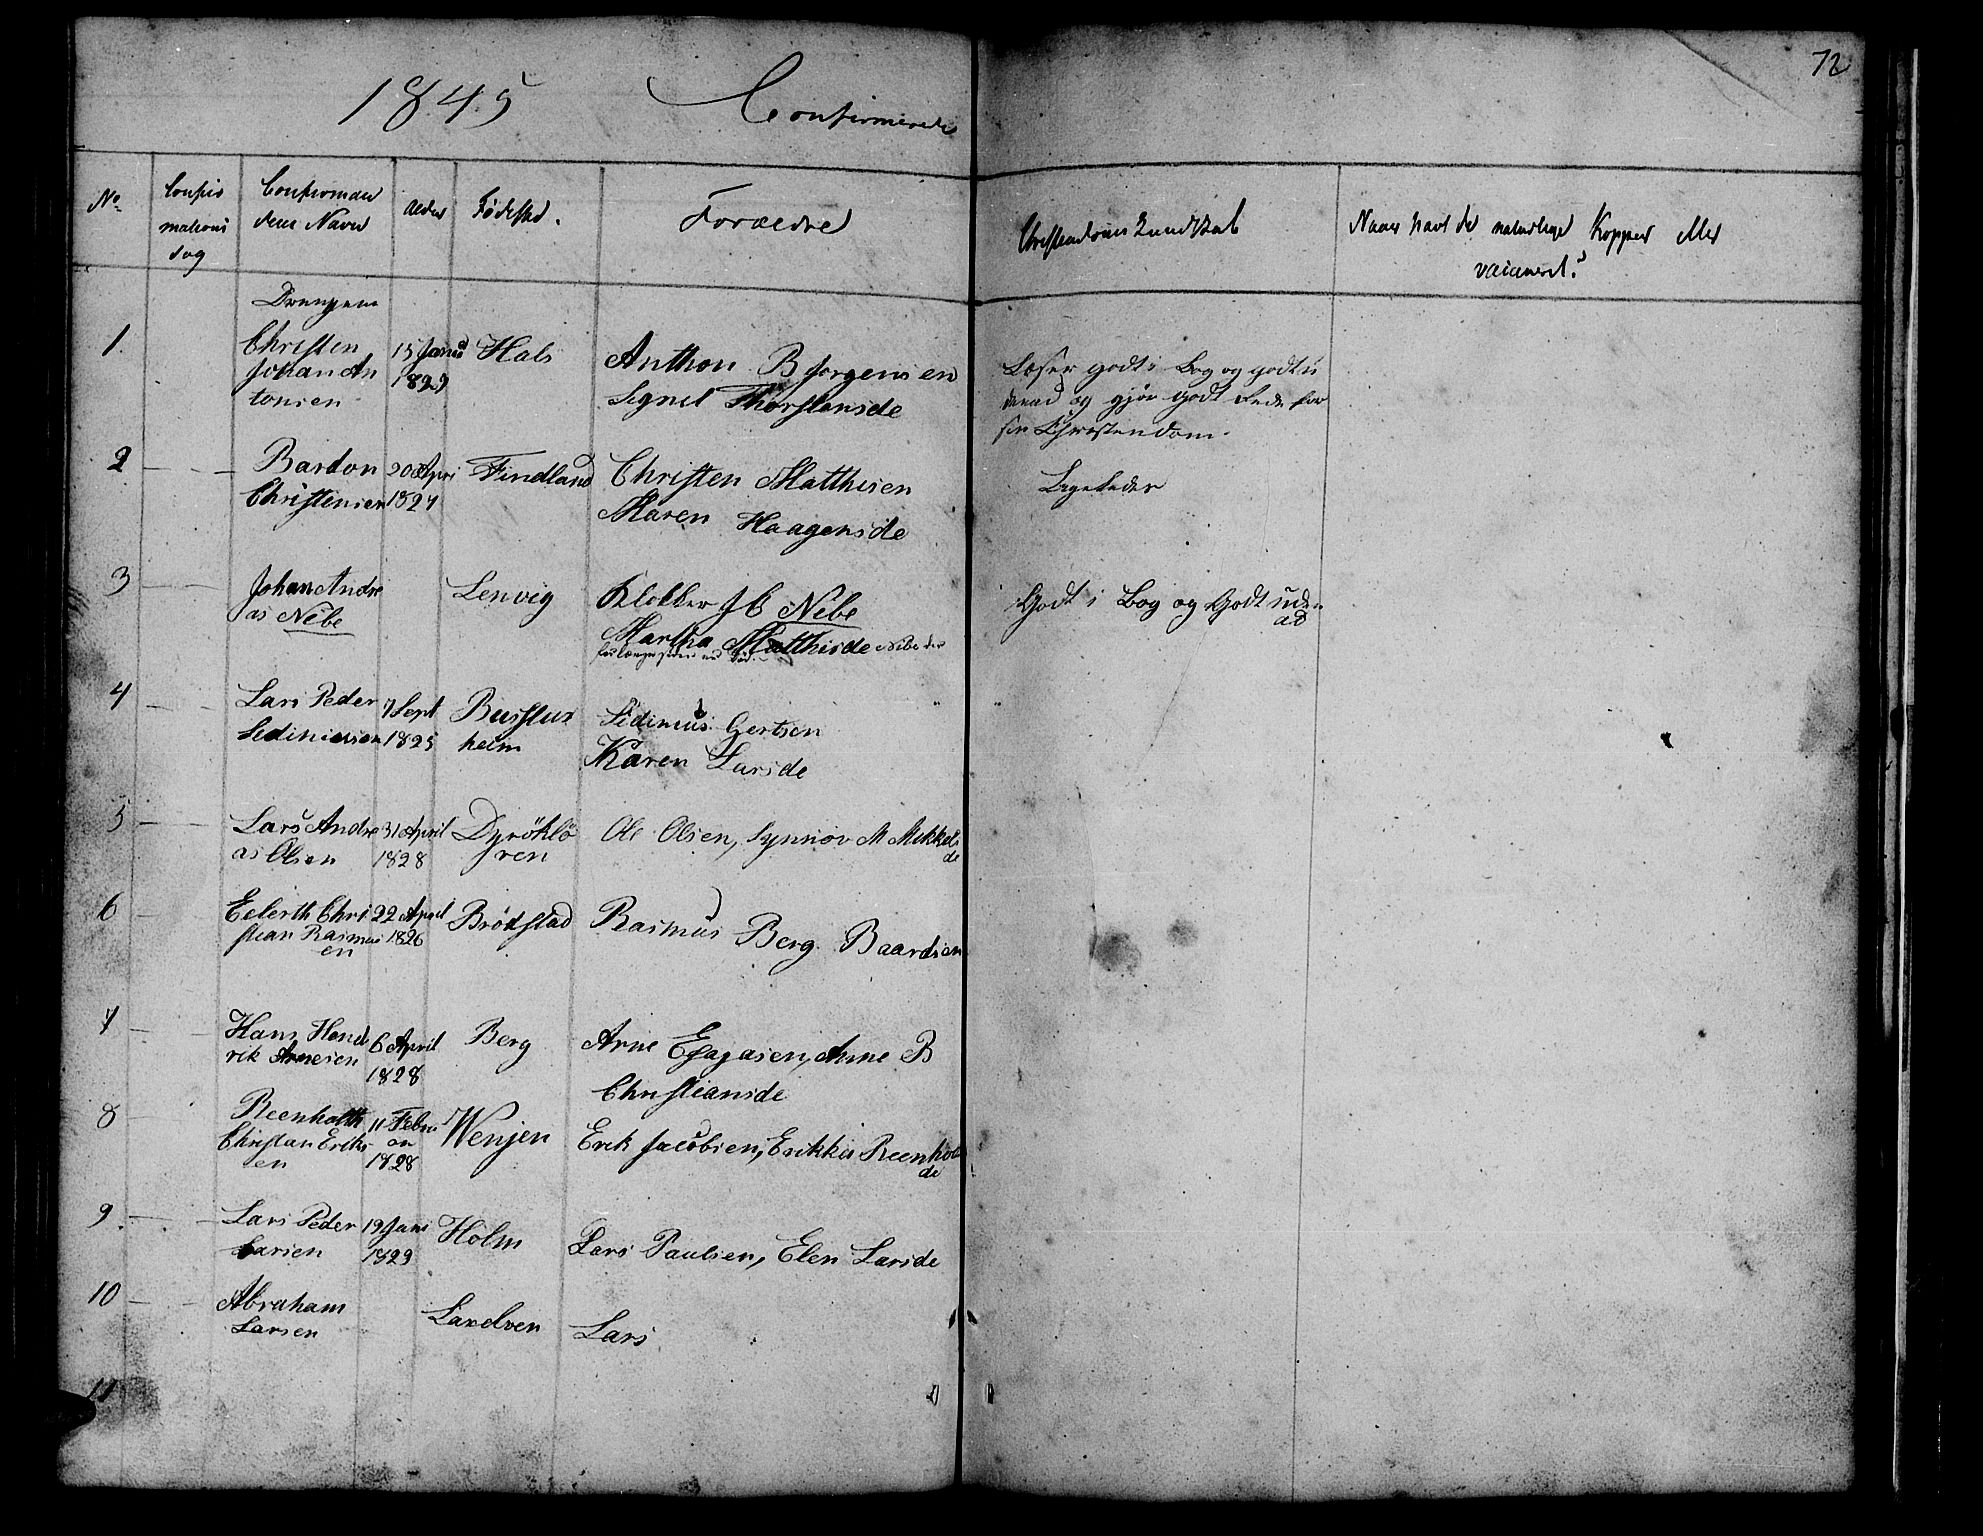 SATØ, Tranøy sokneprestkontor, I/Ia/Iab/L0011klokker: Klokkerbok nr. 11, 1845-1859, s. 72